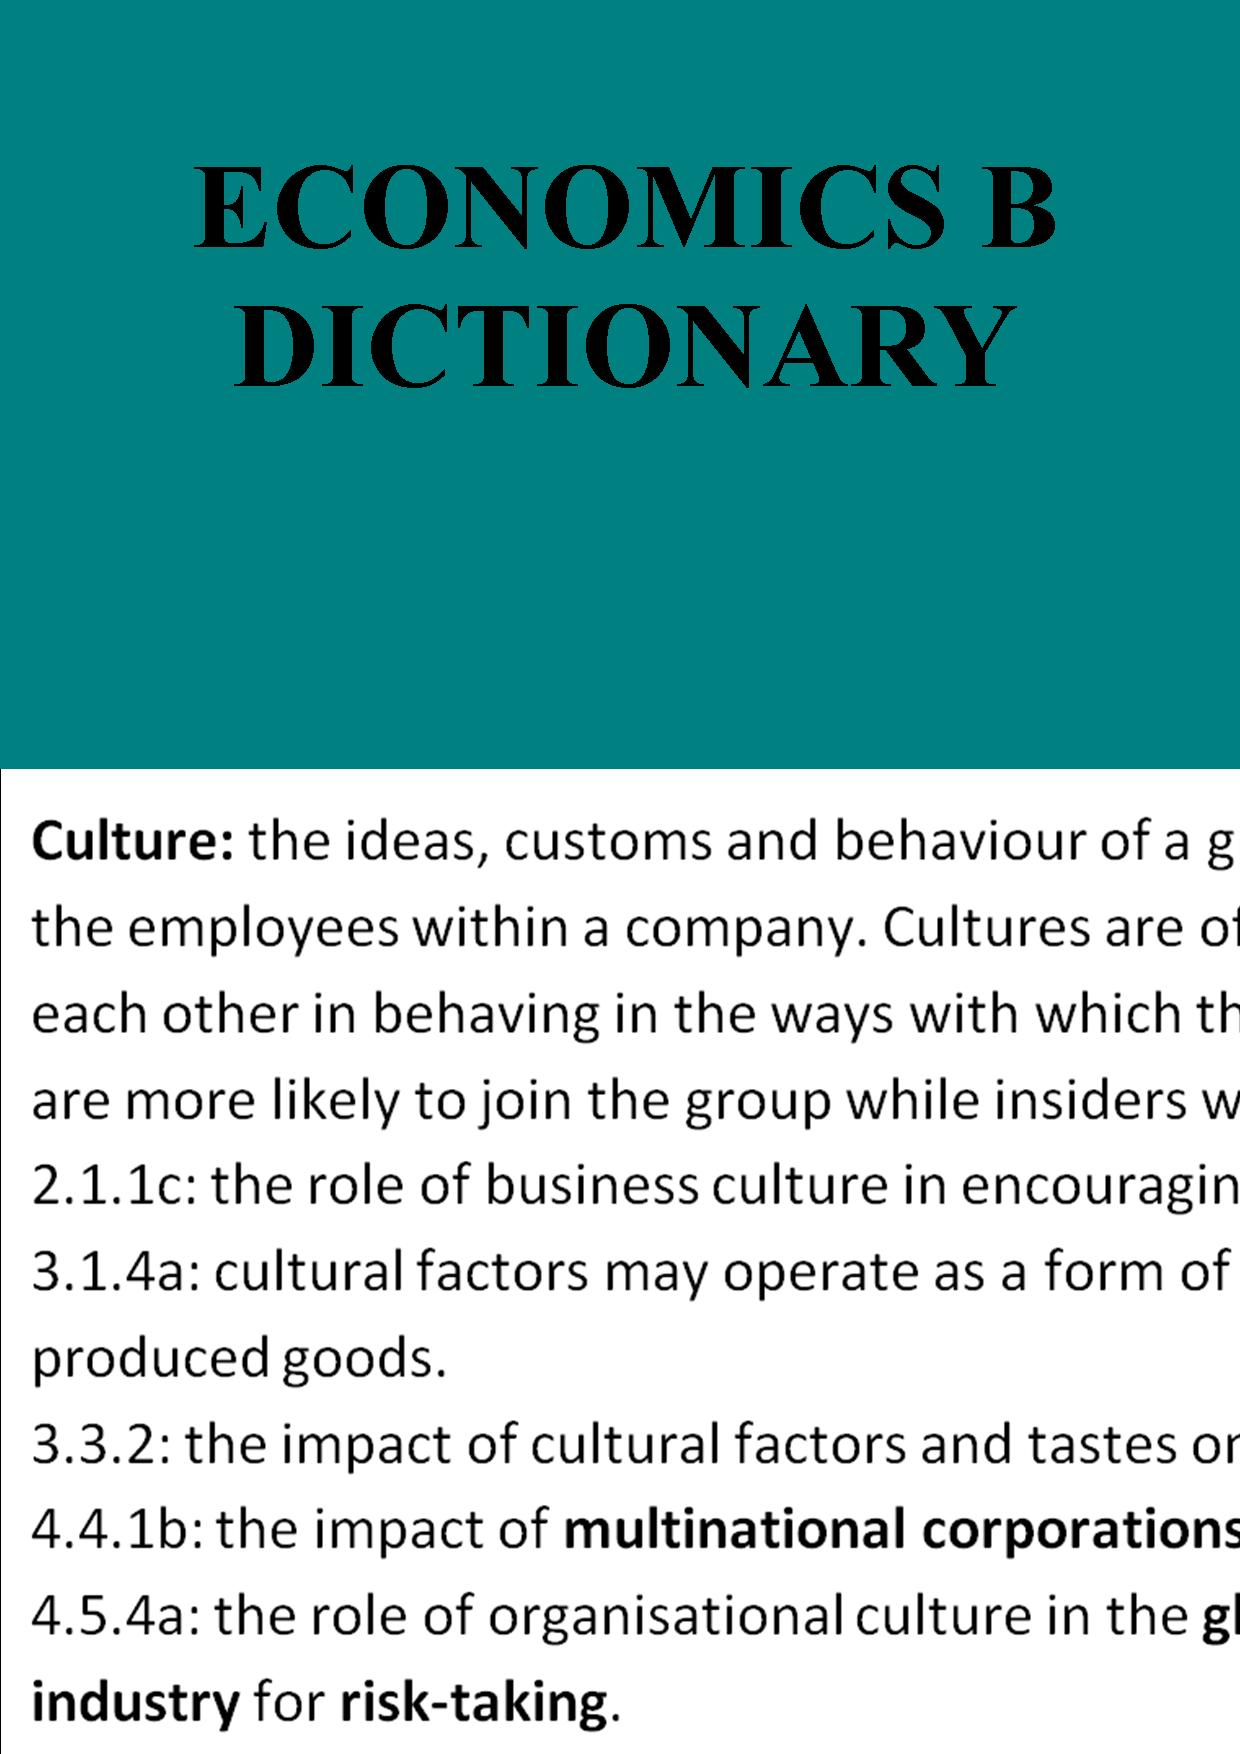 Economics B dictionary